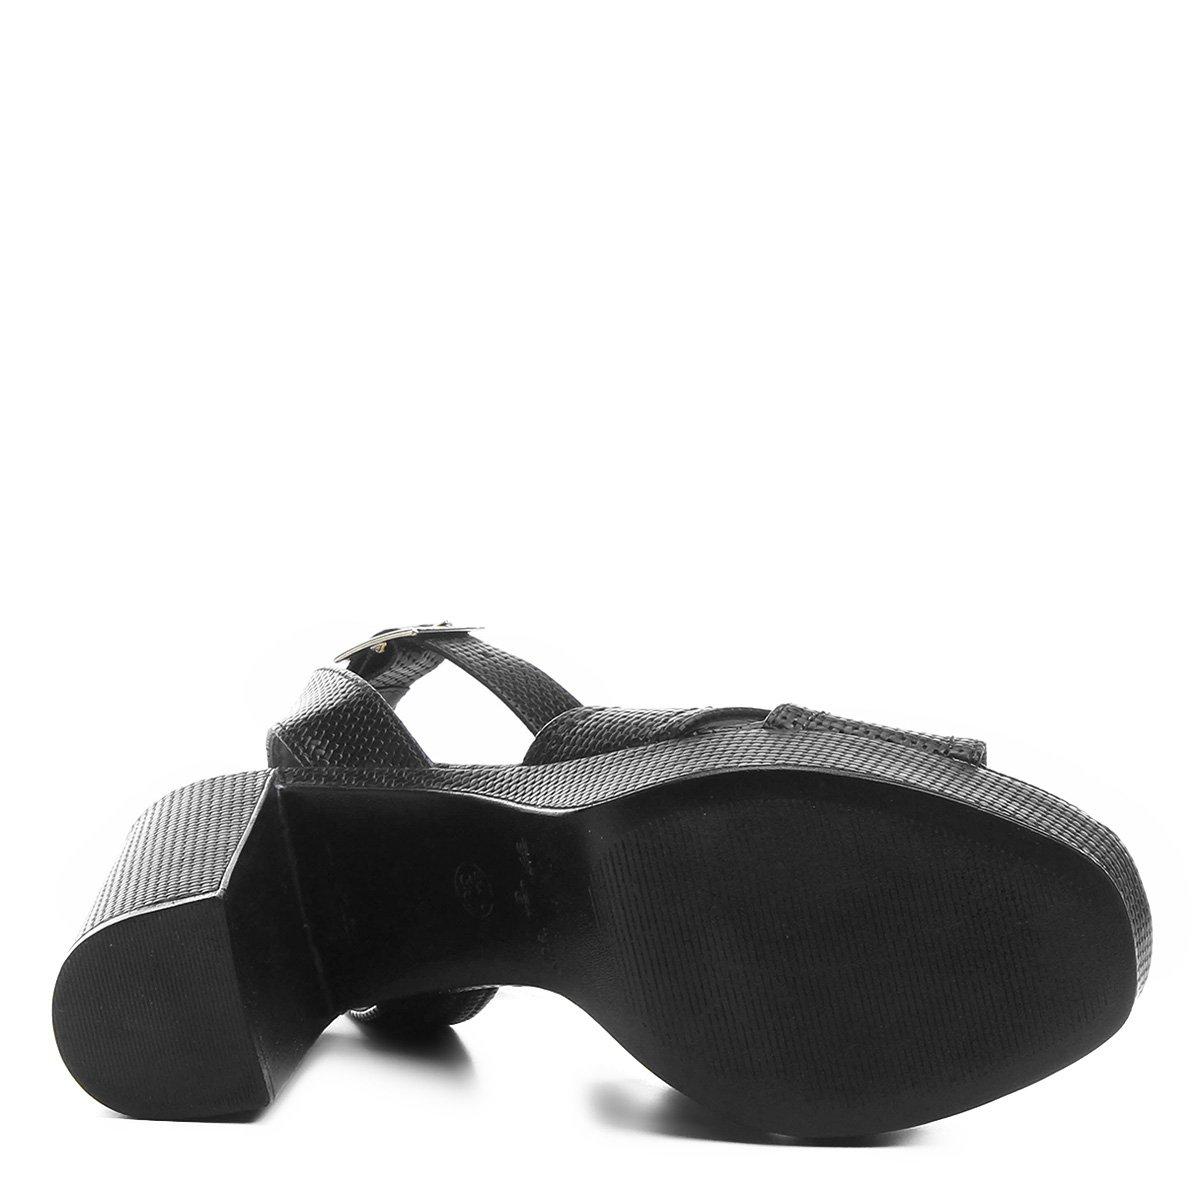 Sandália Pata Meia Pata Sandália Meia Preto Trama Shoestock Shoestock Trama Shoestock Feminina Meia Sandália Preto Pata Feminina g8qp4w